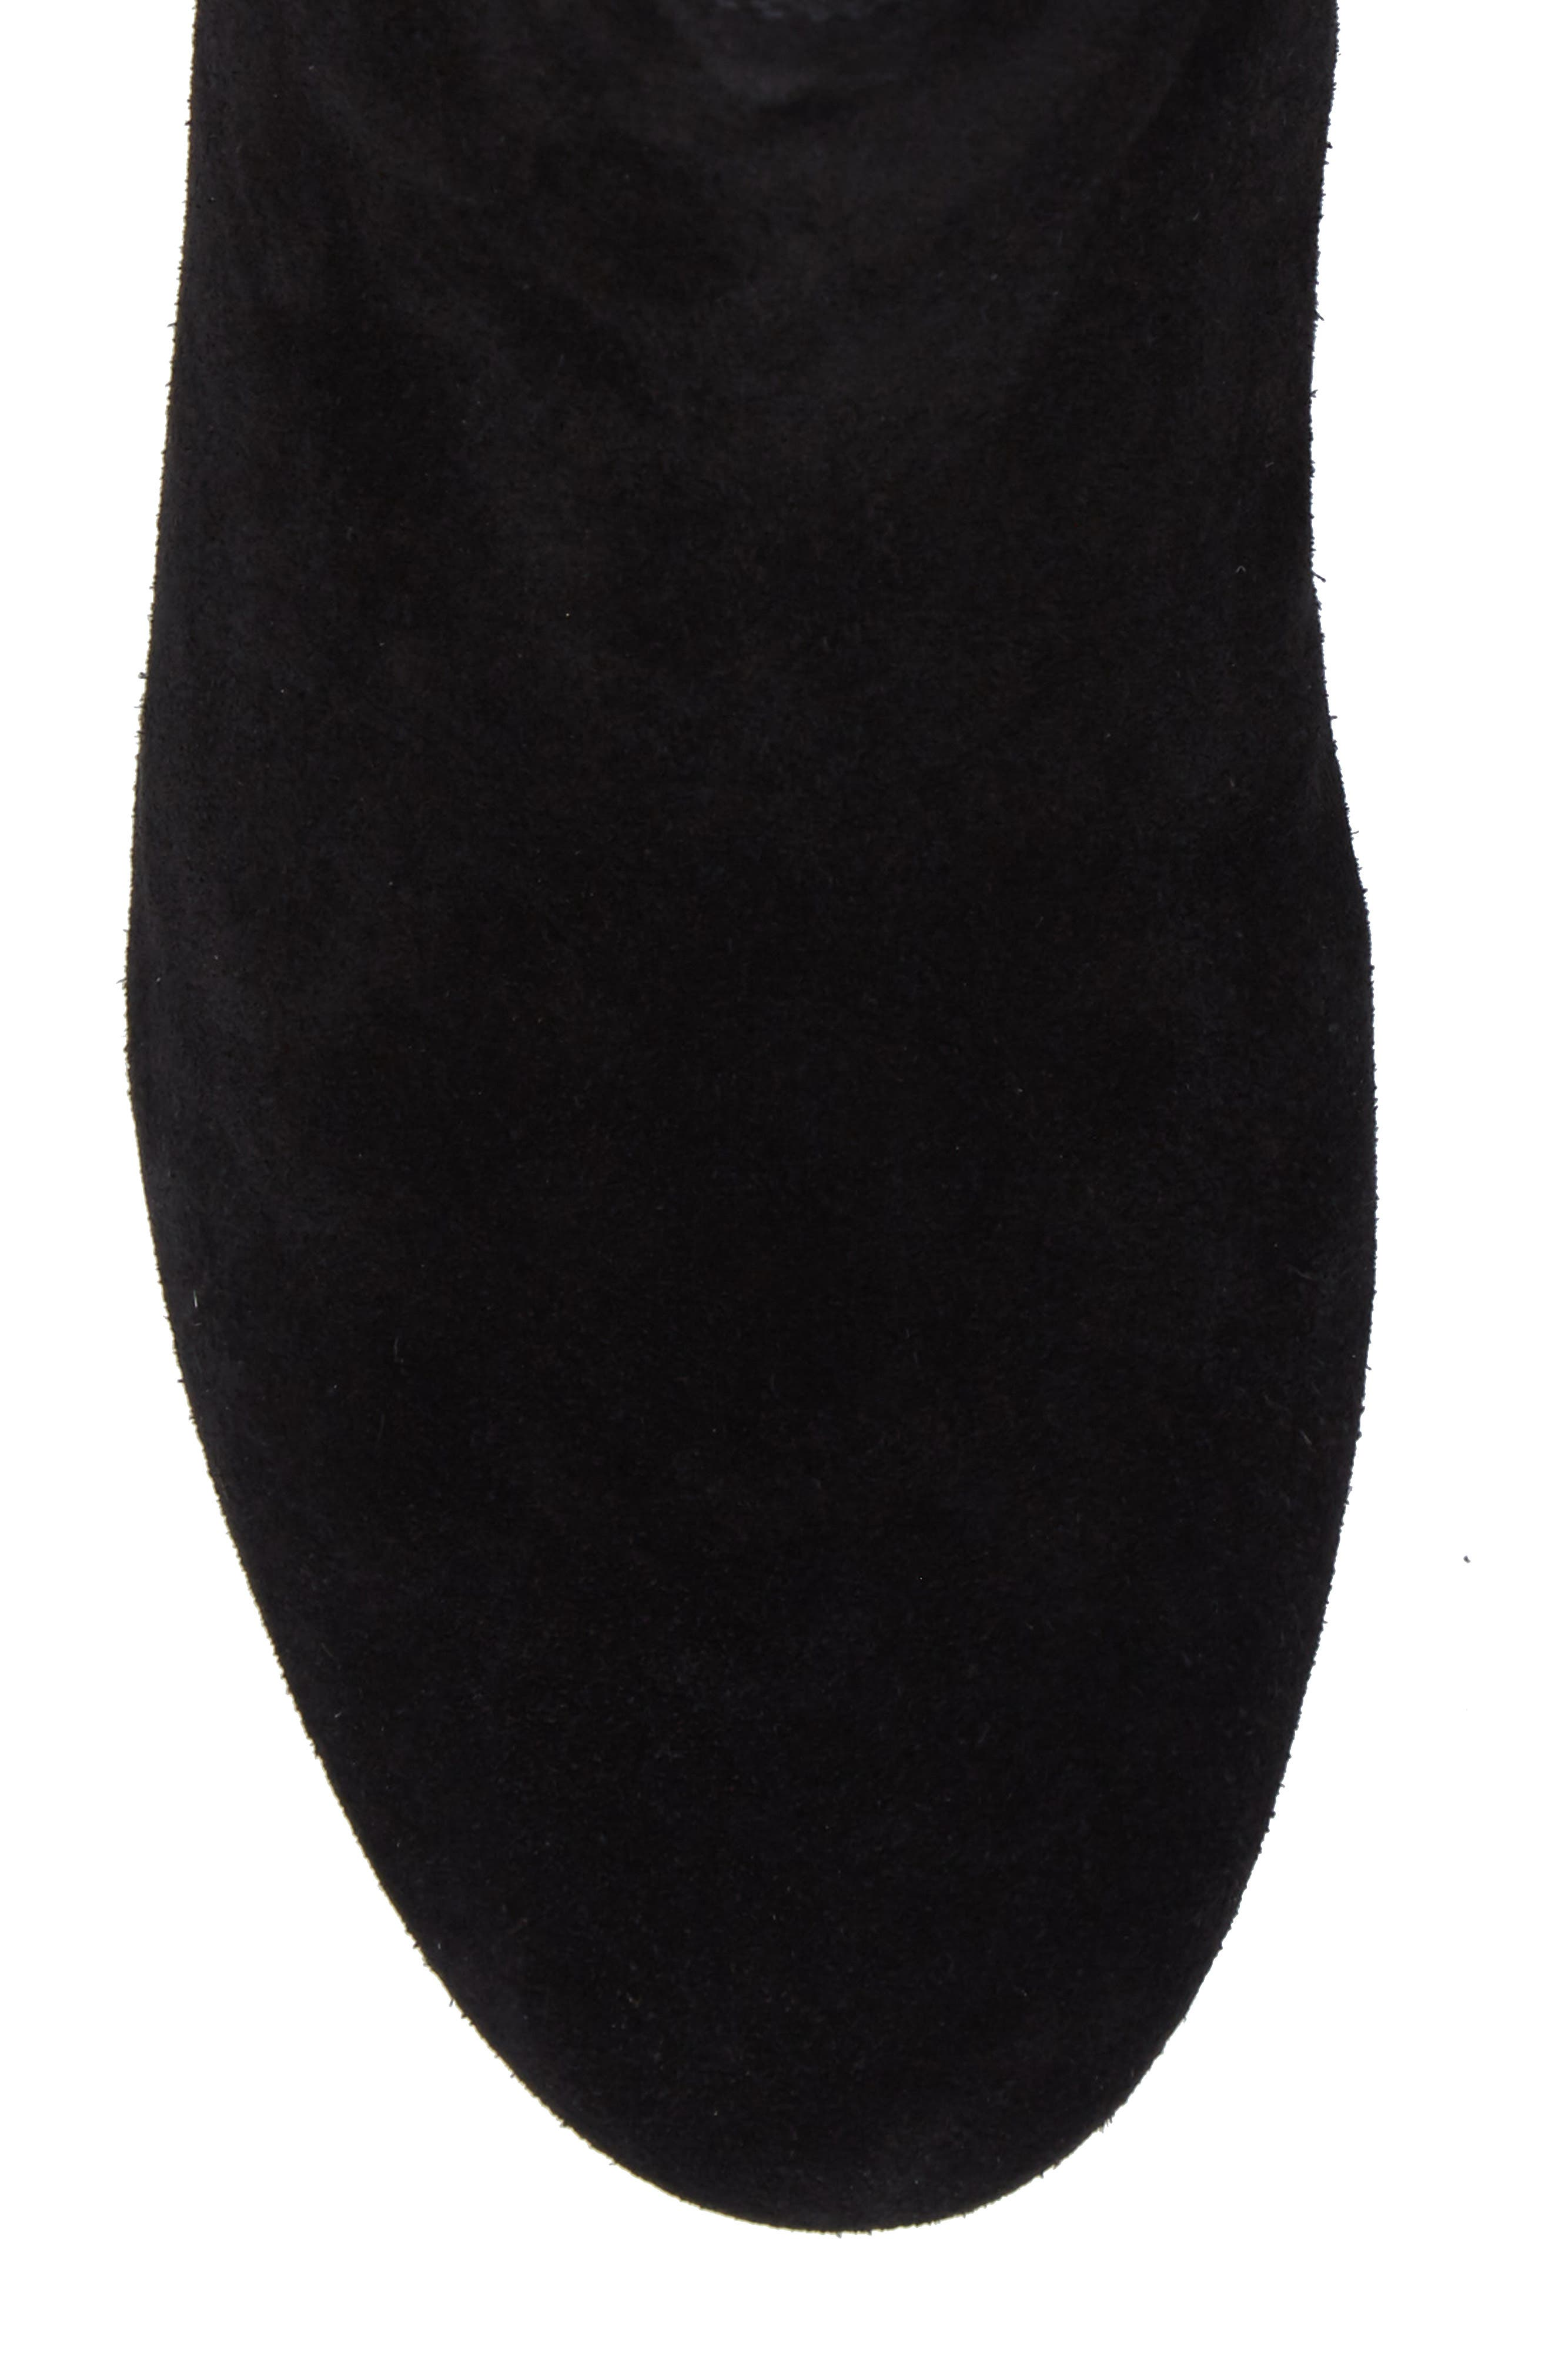 Barley Chelsea Boot,                             Alternate thumbnail 4, color,                             Black